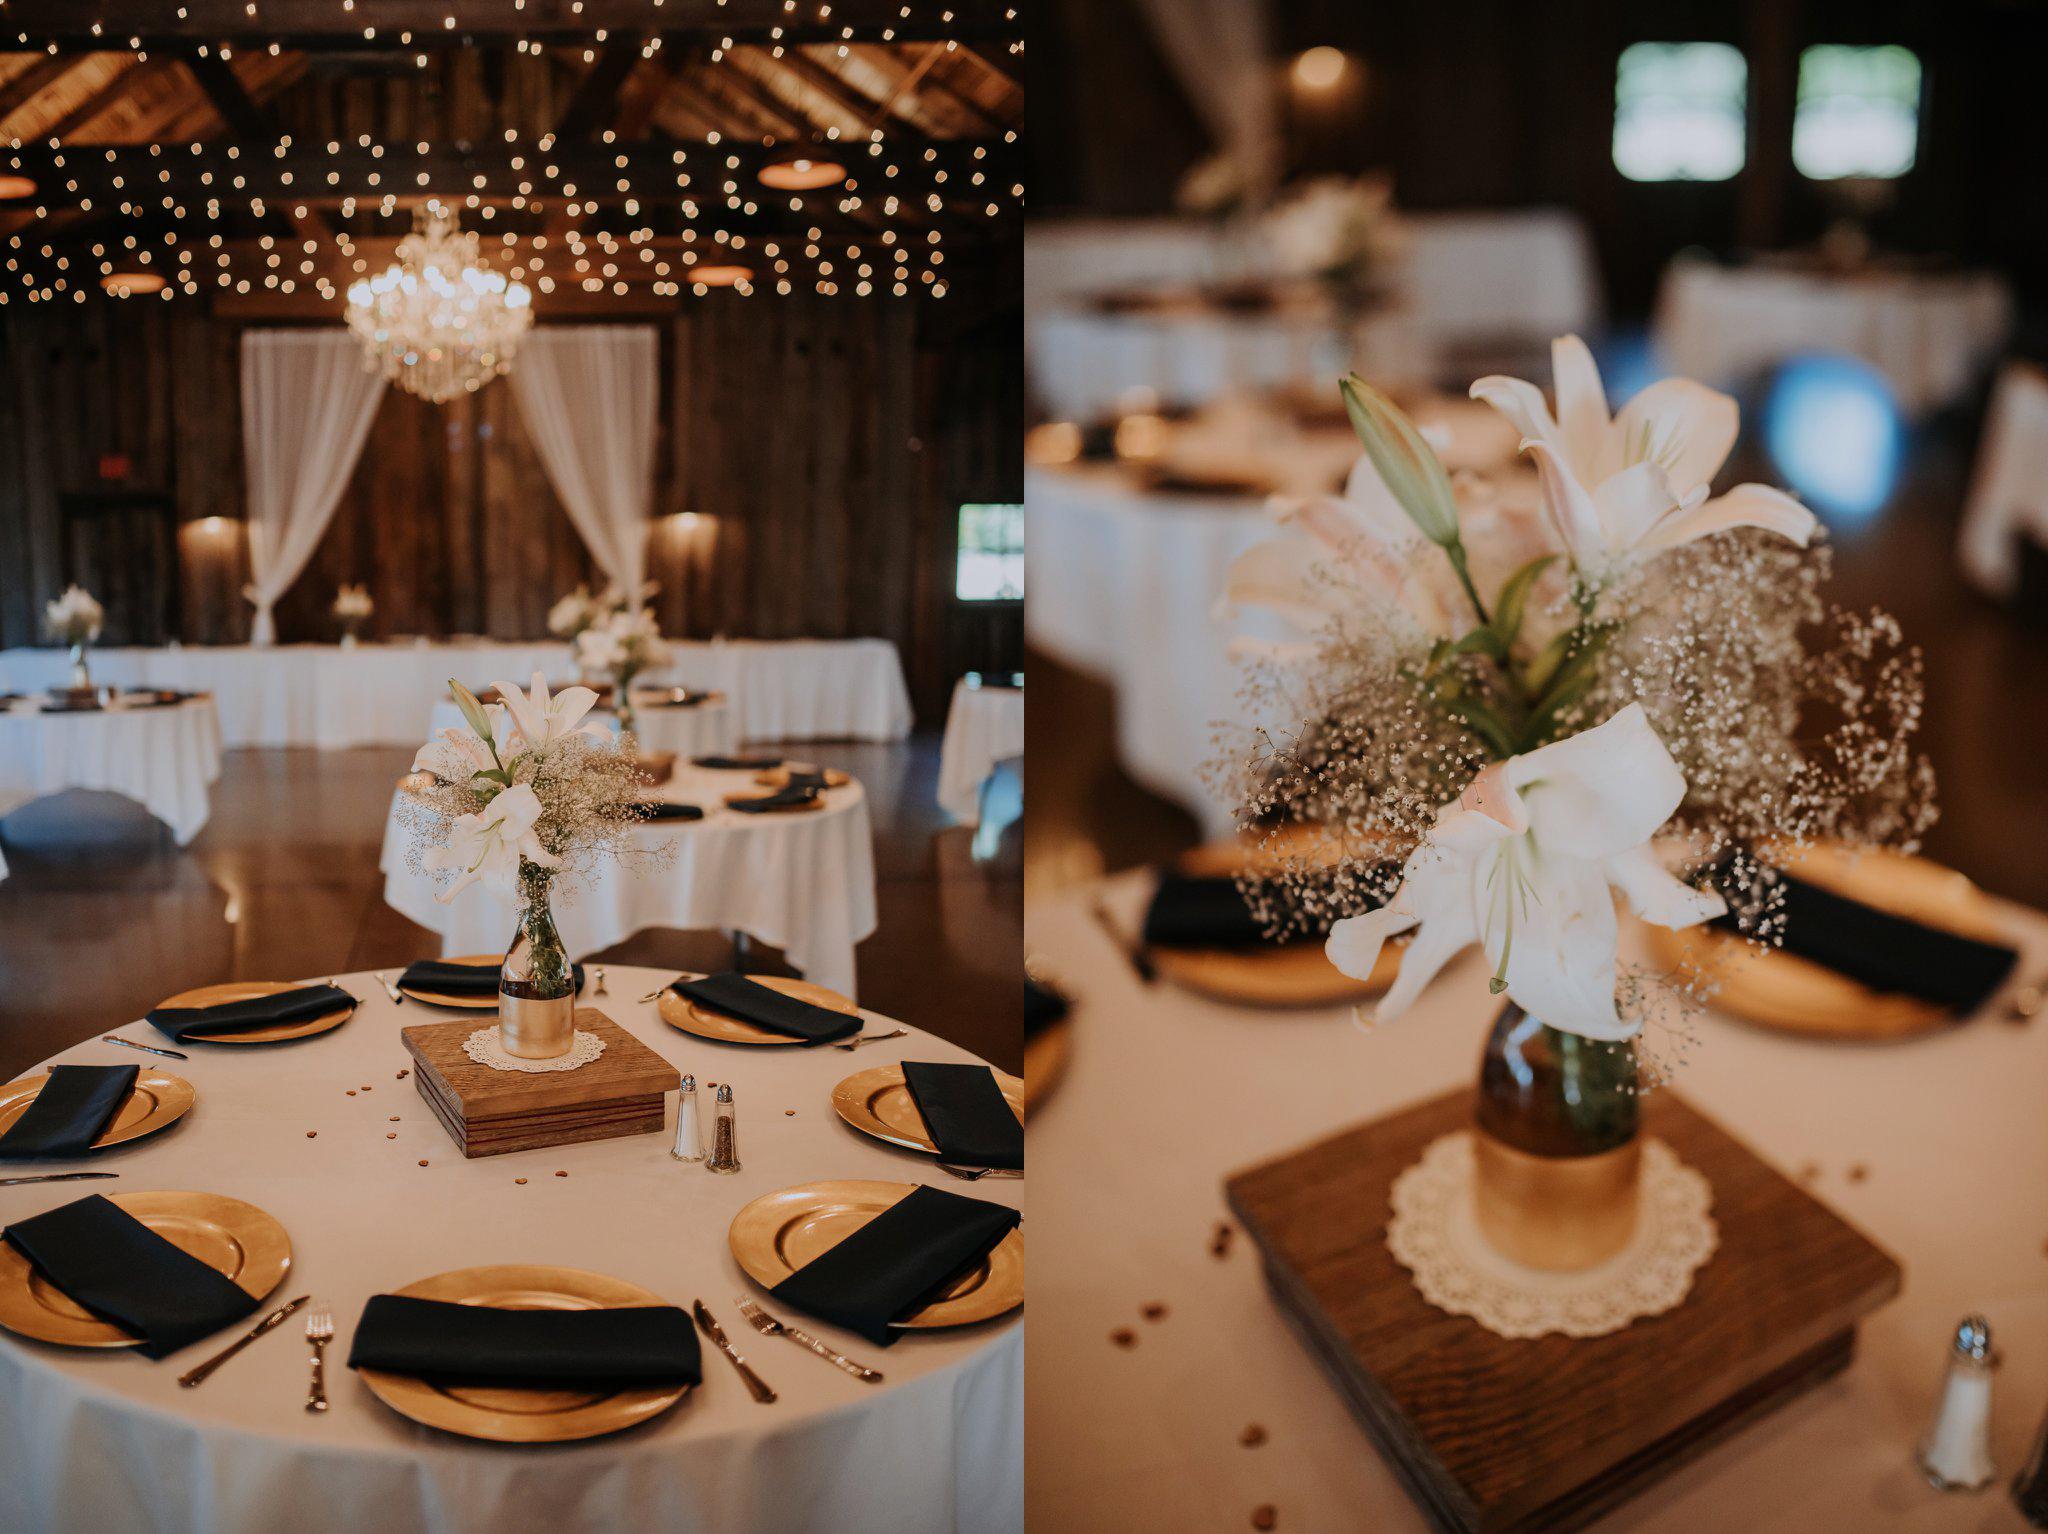 kristen-and-cody-the-kelley-farm-wedding-seattle-photographer-caitlyn-nikula-71.jpg